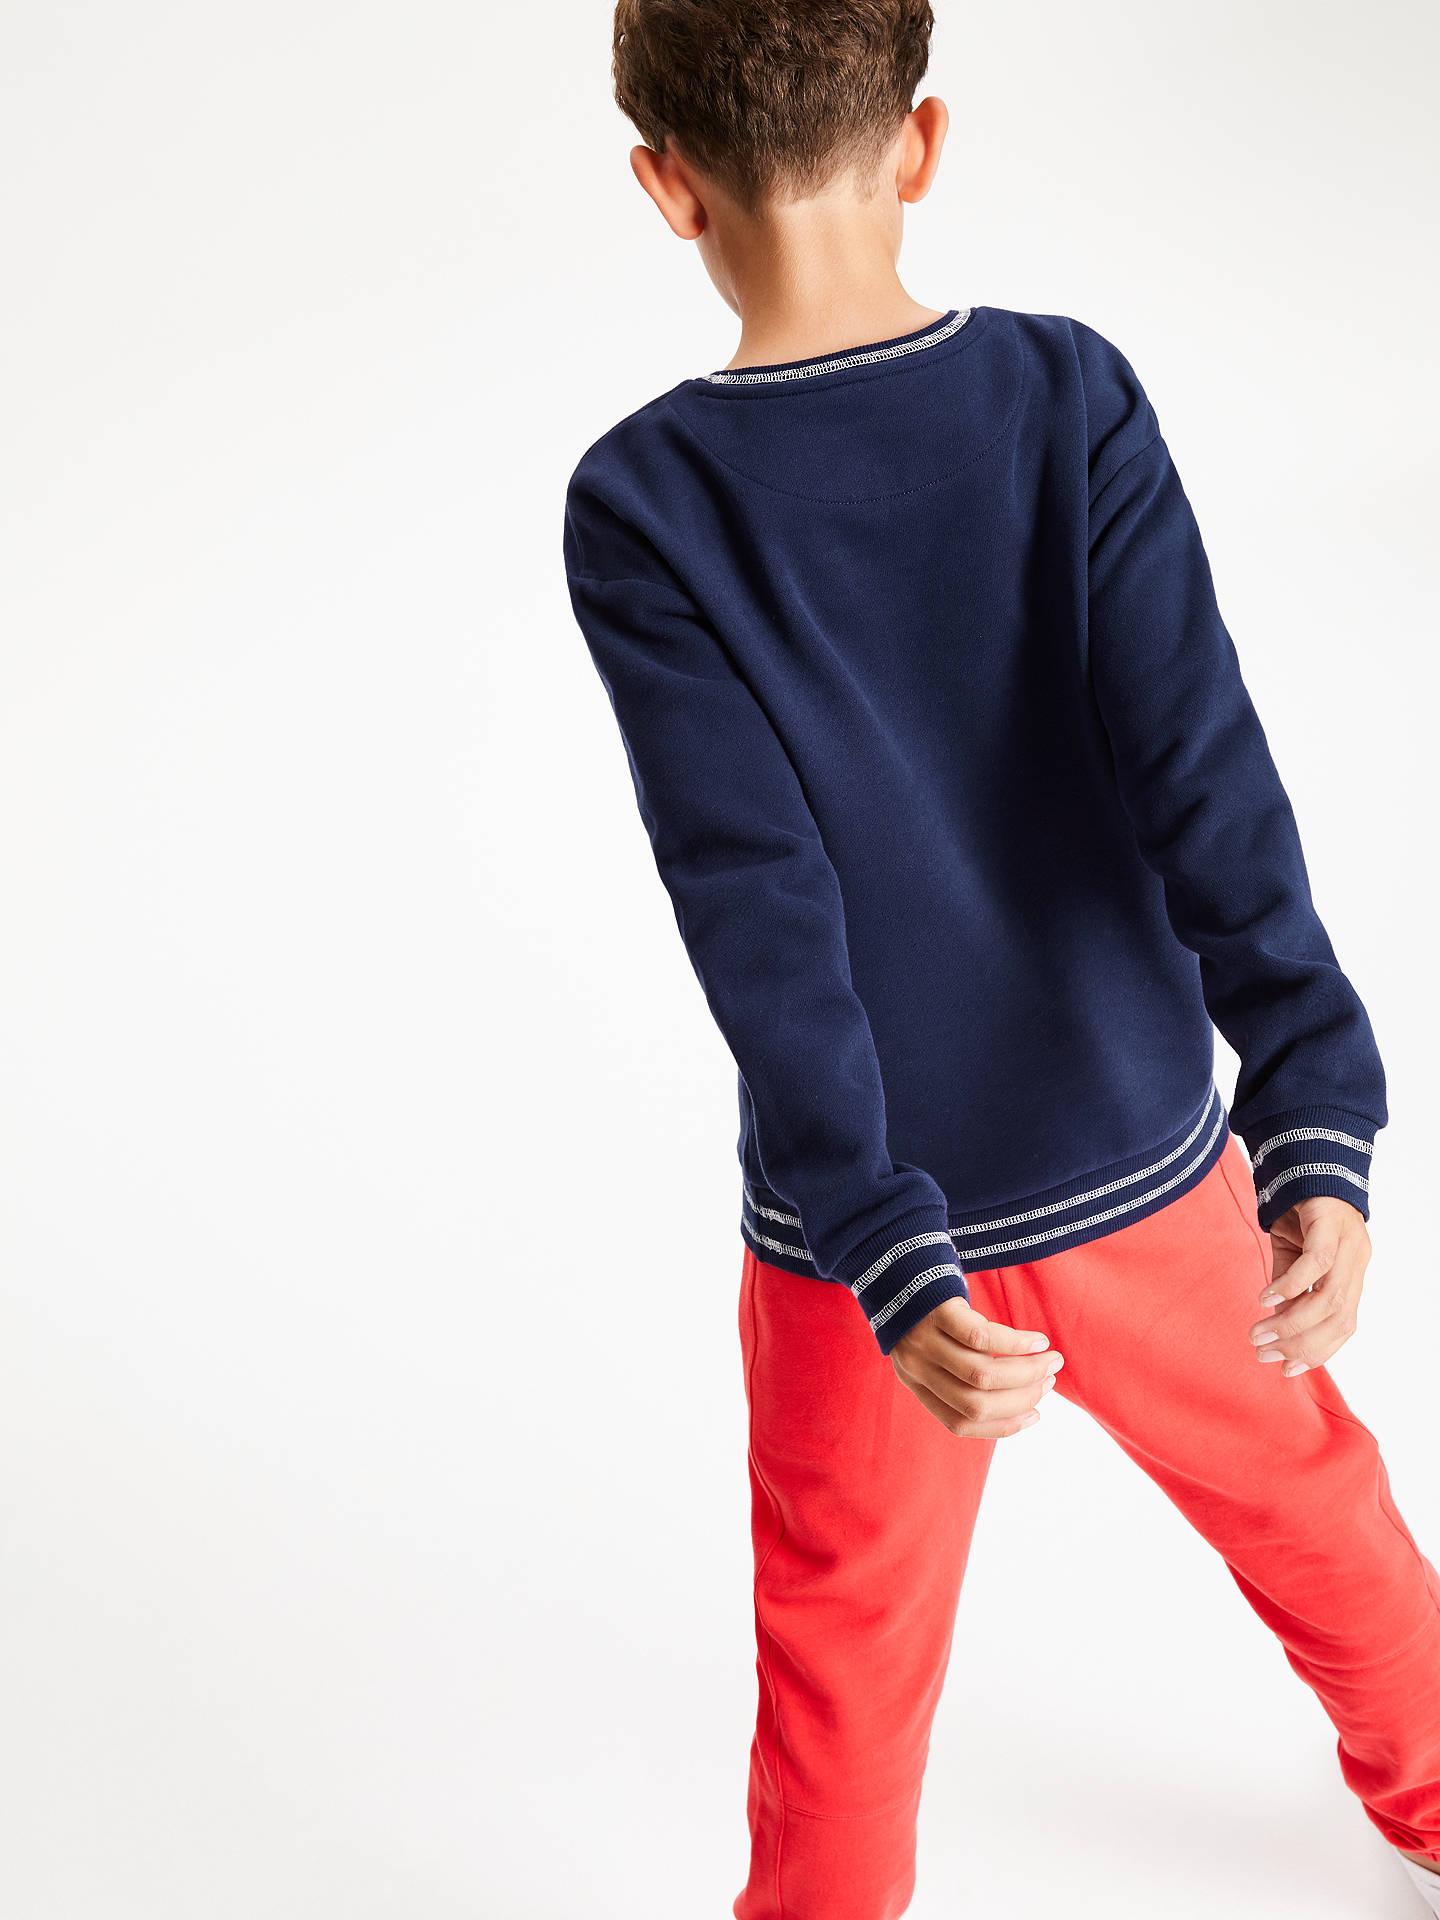 4d0418968 ... Buy John Lewis & Partners Boys' Tiger Long Sleeve Sweater, Navy, 8 years  ...